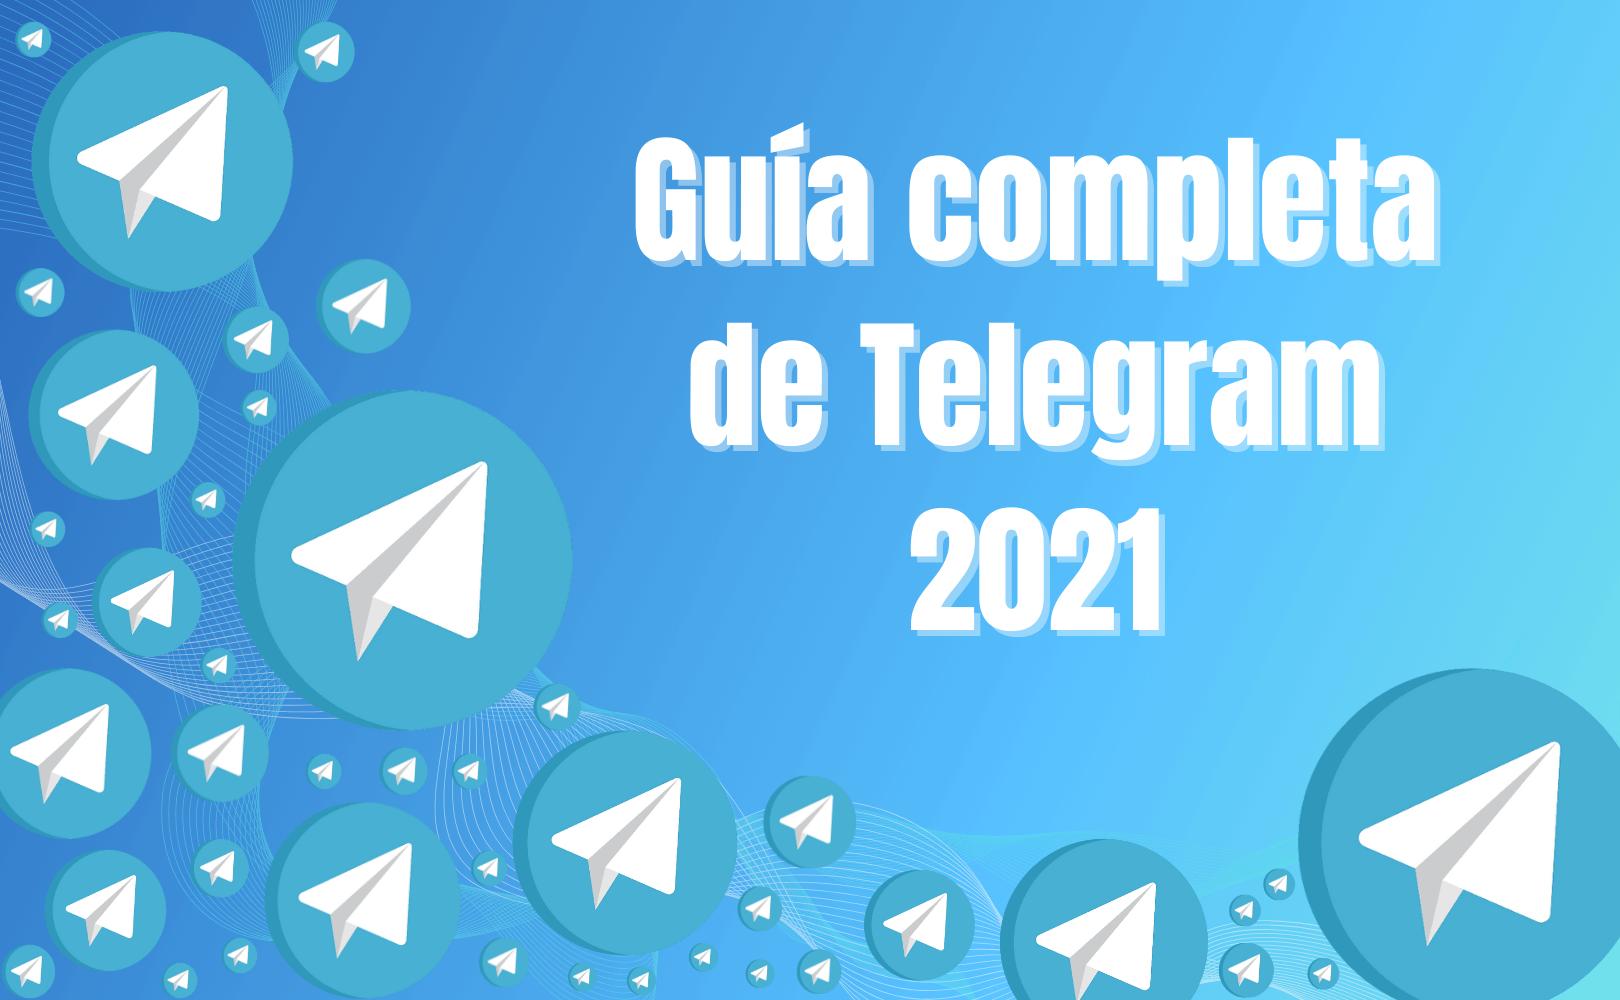 Guía completa de Telegram 2021